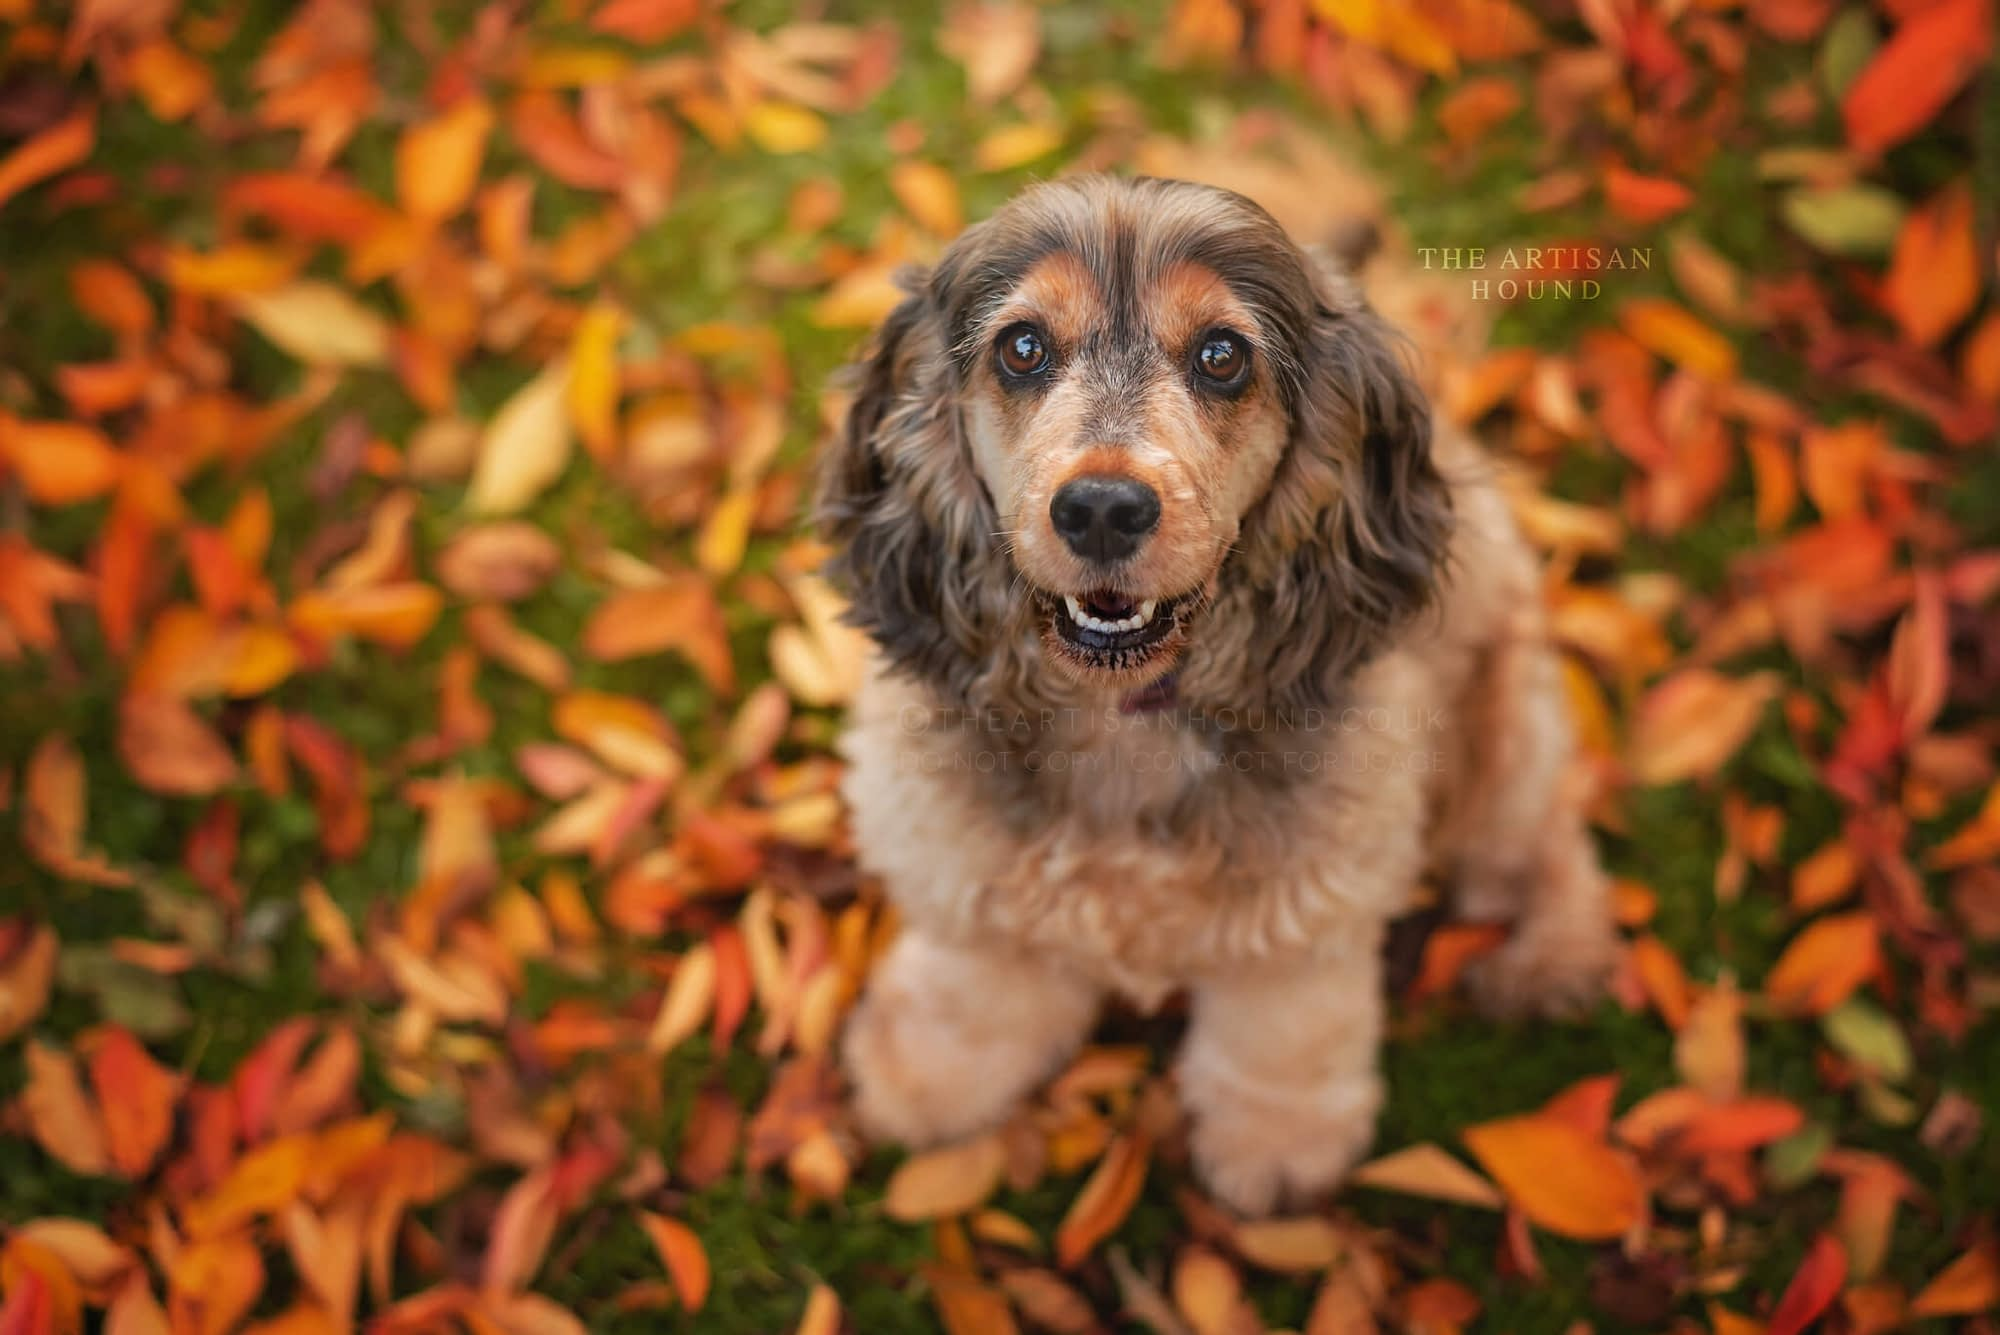 Cocker Spaniel dog sitting in autumn leaves